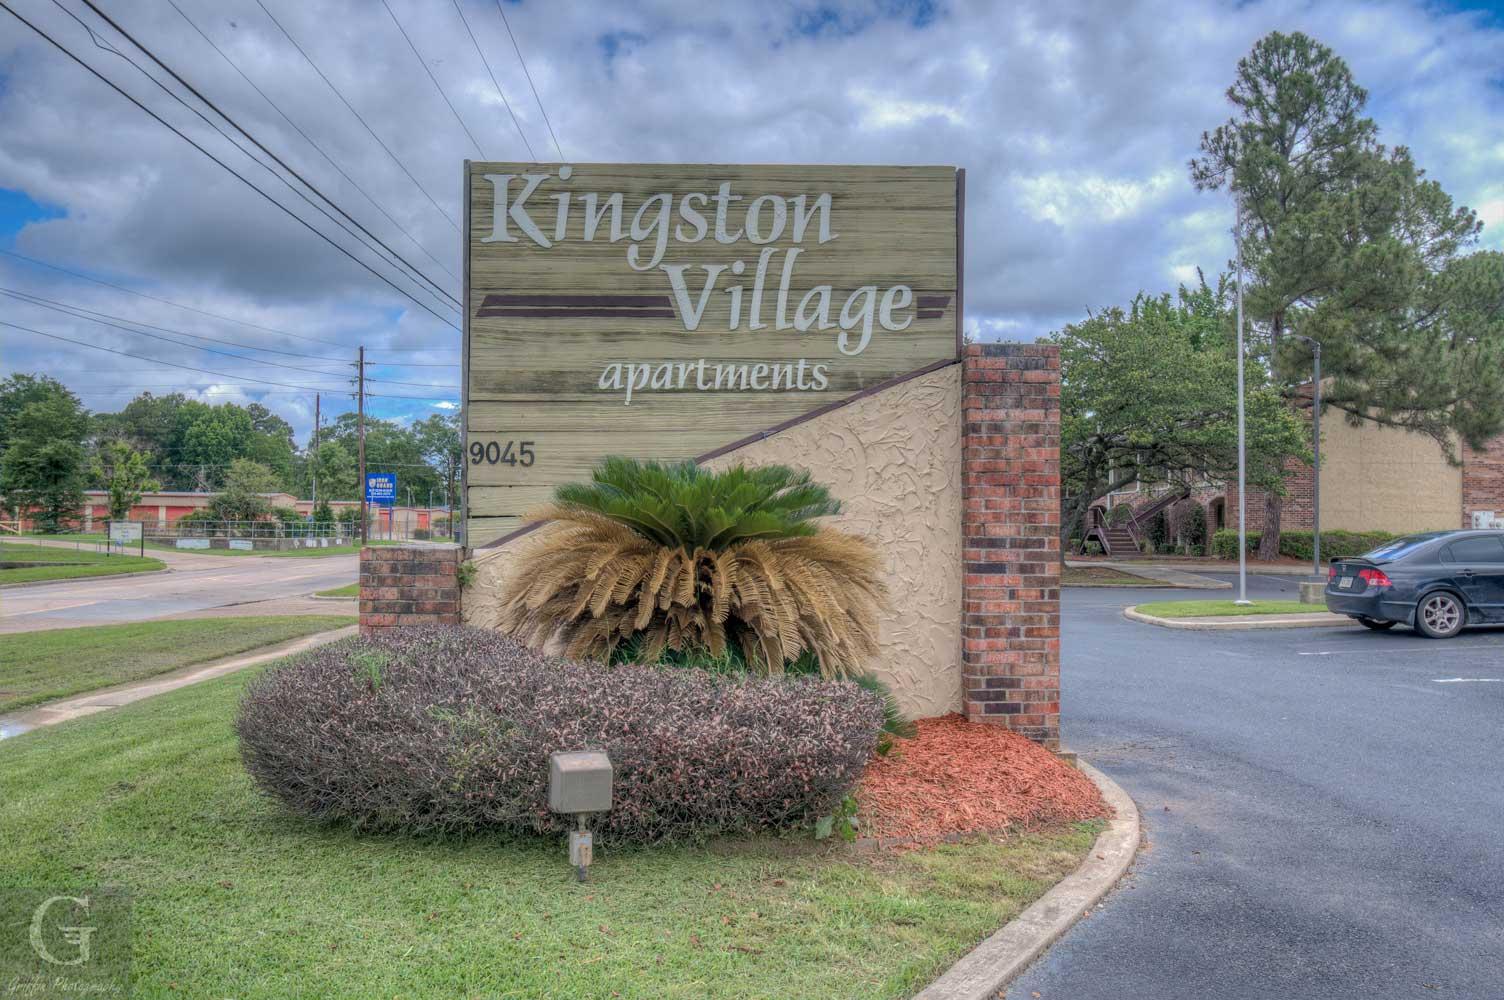 Welcome Signage at Kingston Village Apartments in Shreveport, LA